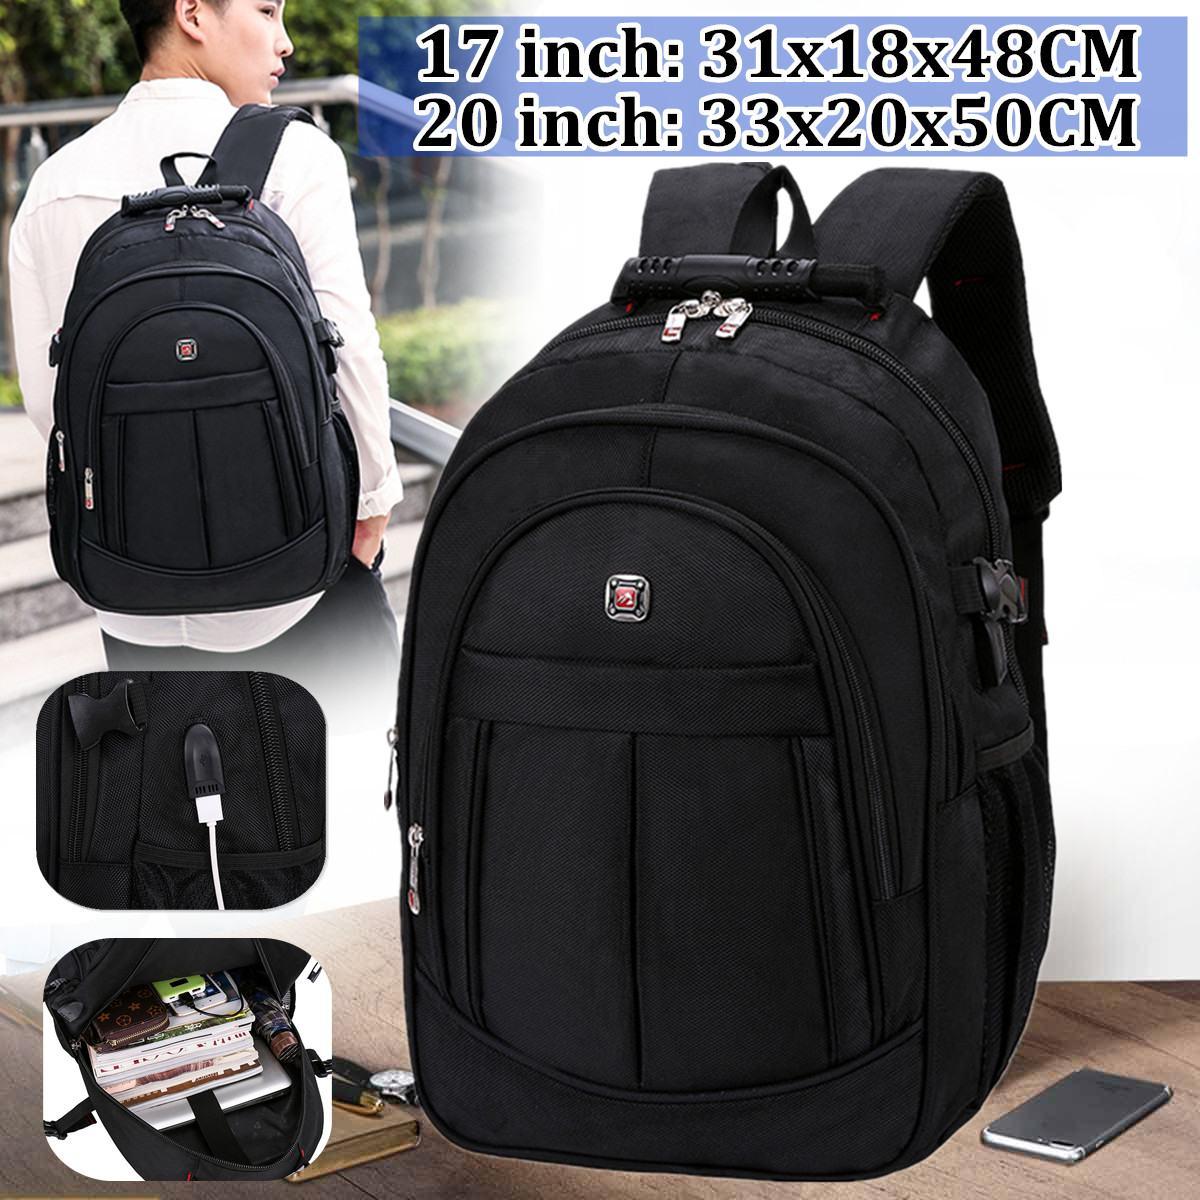 2020 New Fashion 17.3inch Laptop Backpack Men Multifunctional Waterproof Backpacks Male USB Charging Travel Backpack Mochila